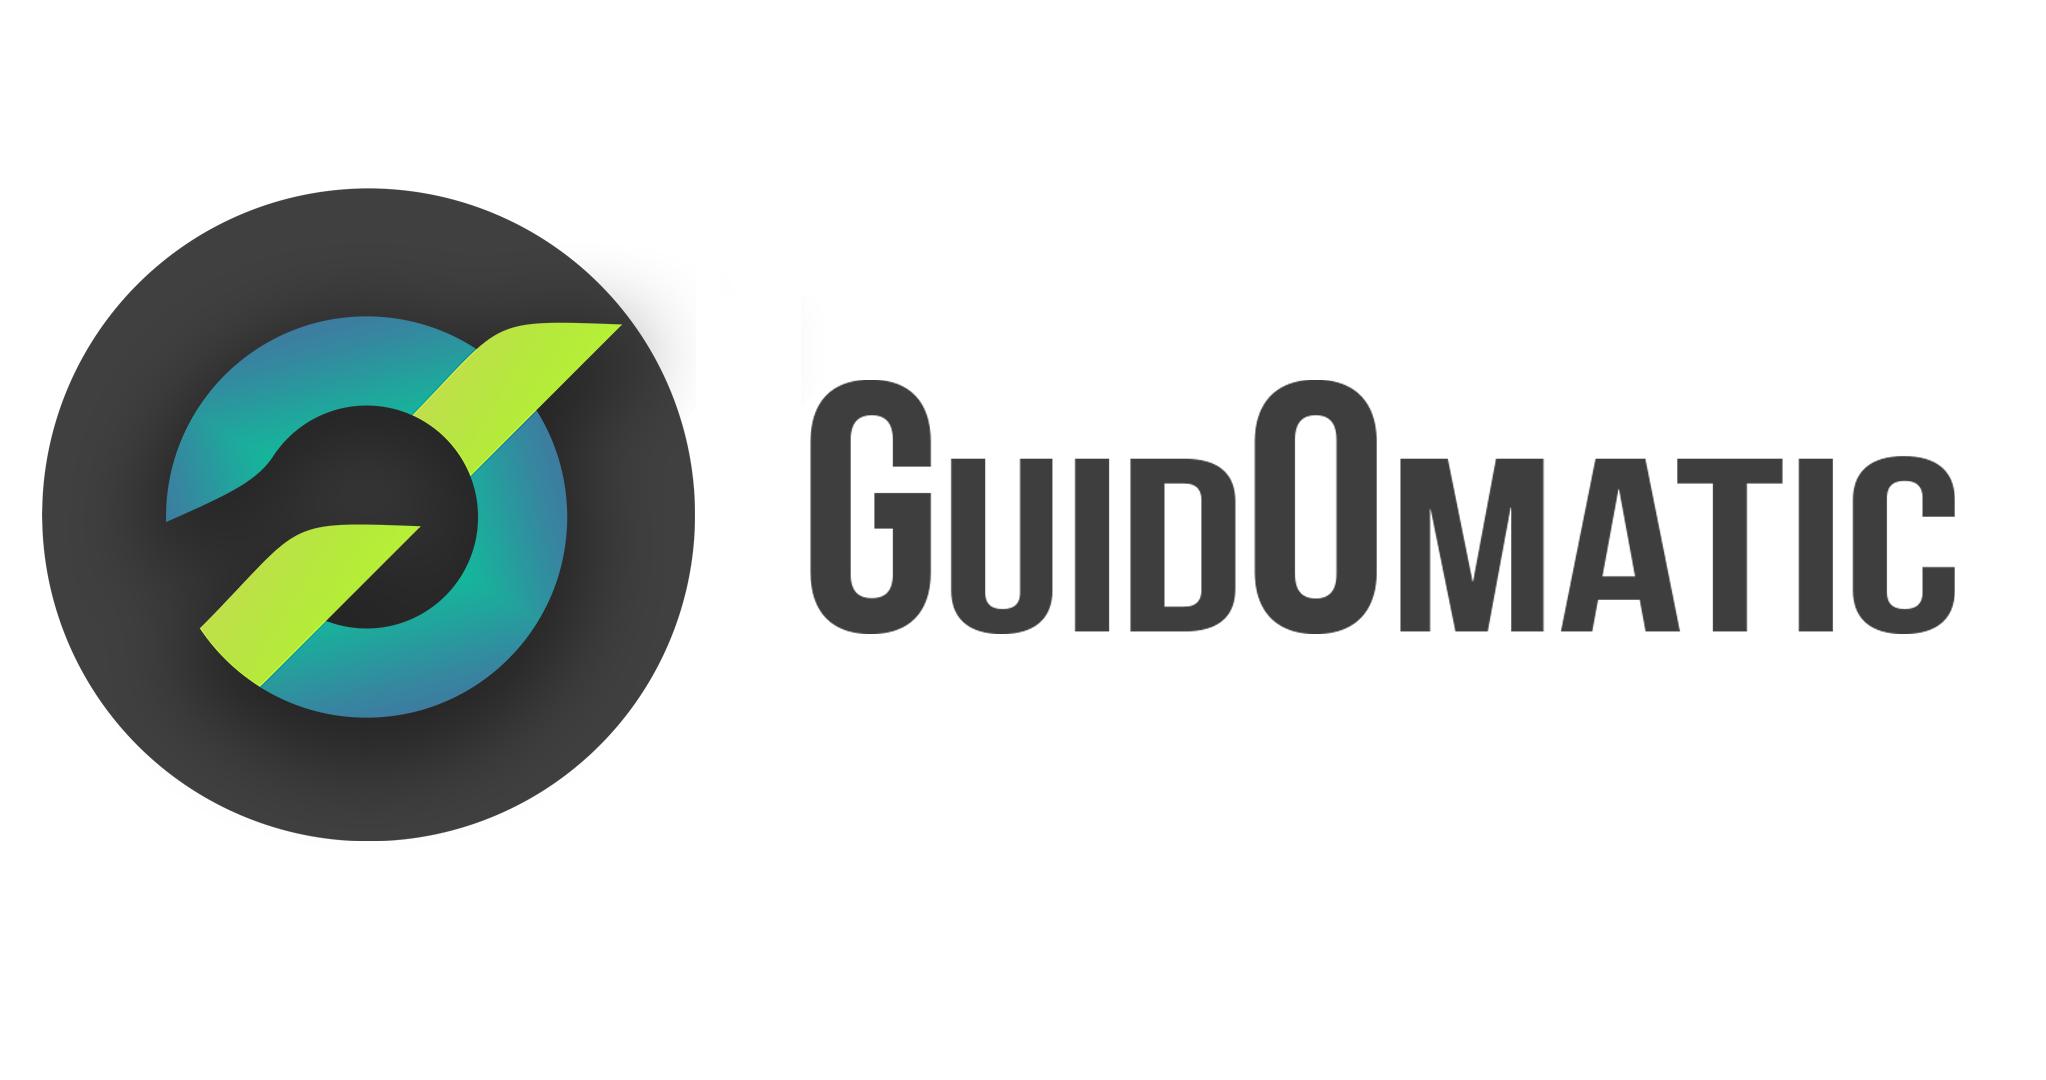 Guidomatic